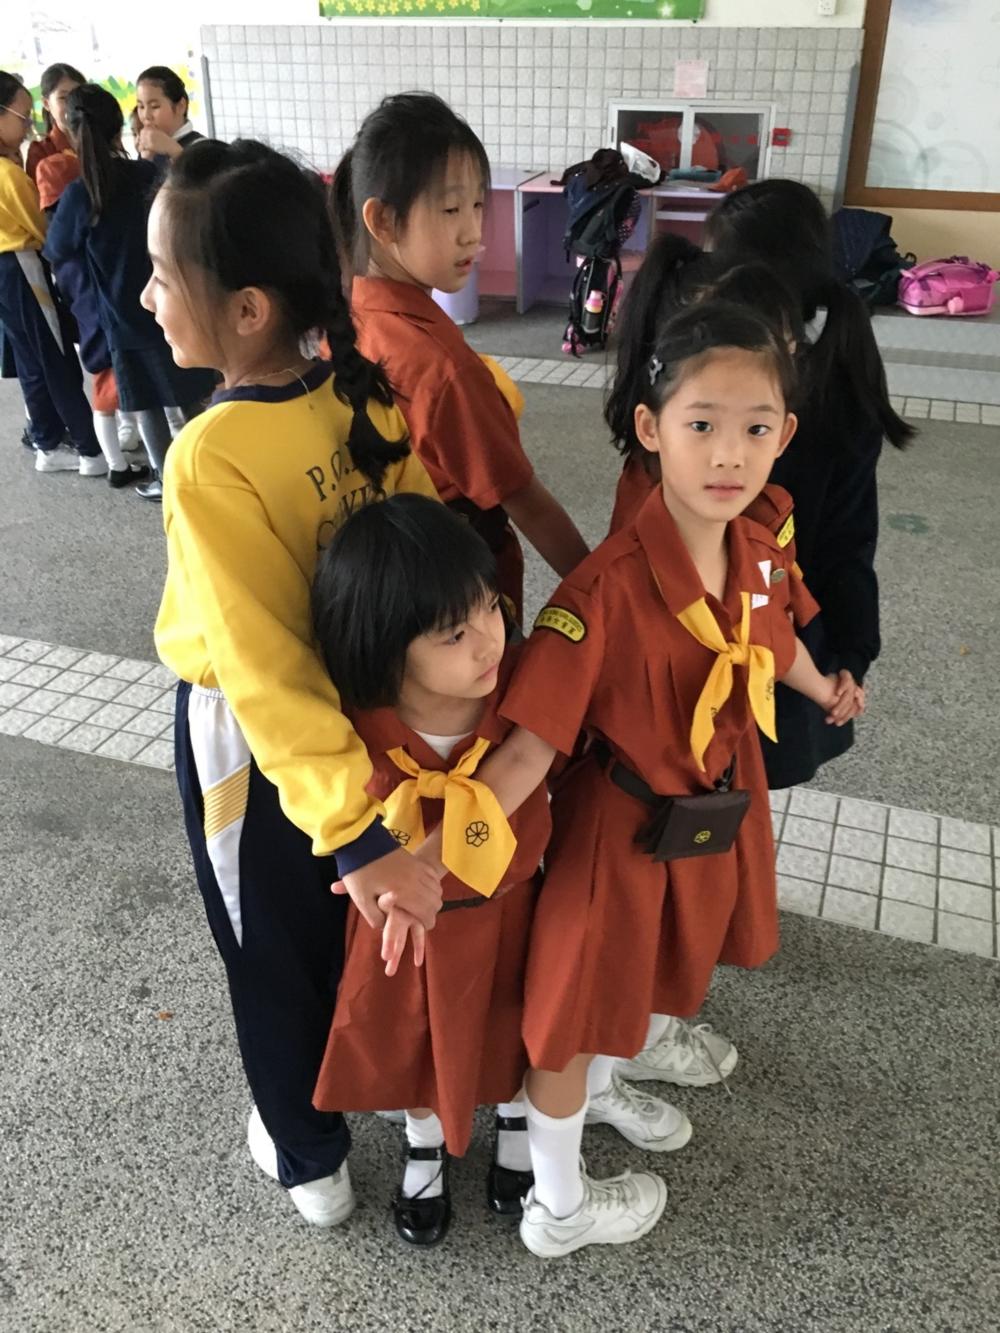 http://pohckwps.edu.hk/sites/default/files/47_9.jpg